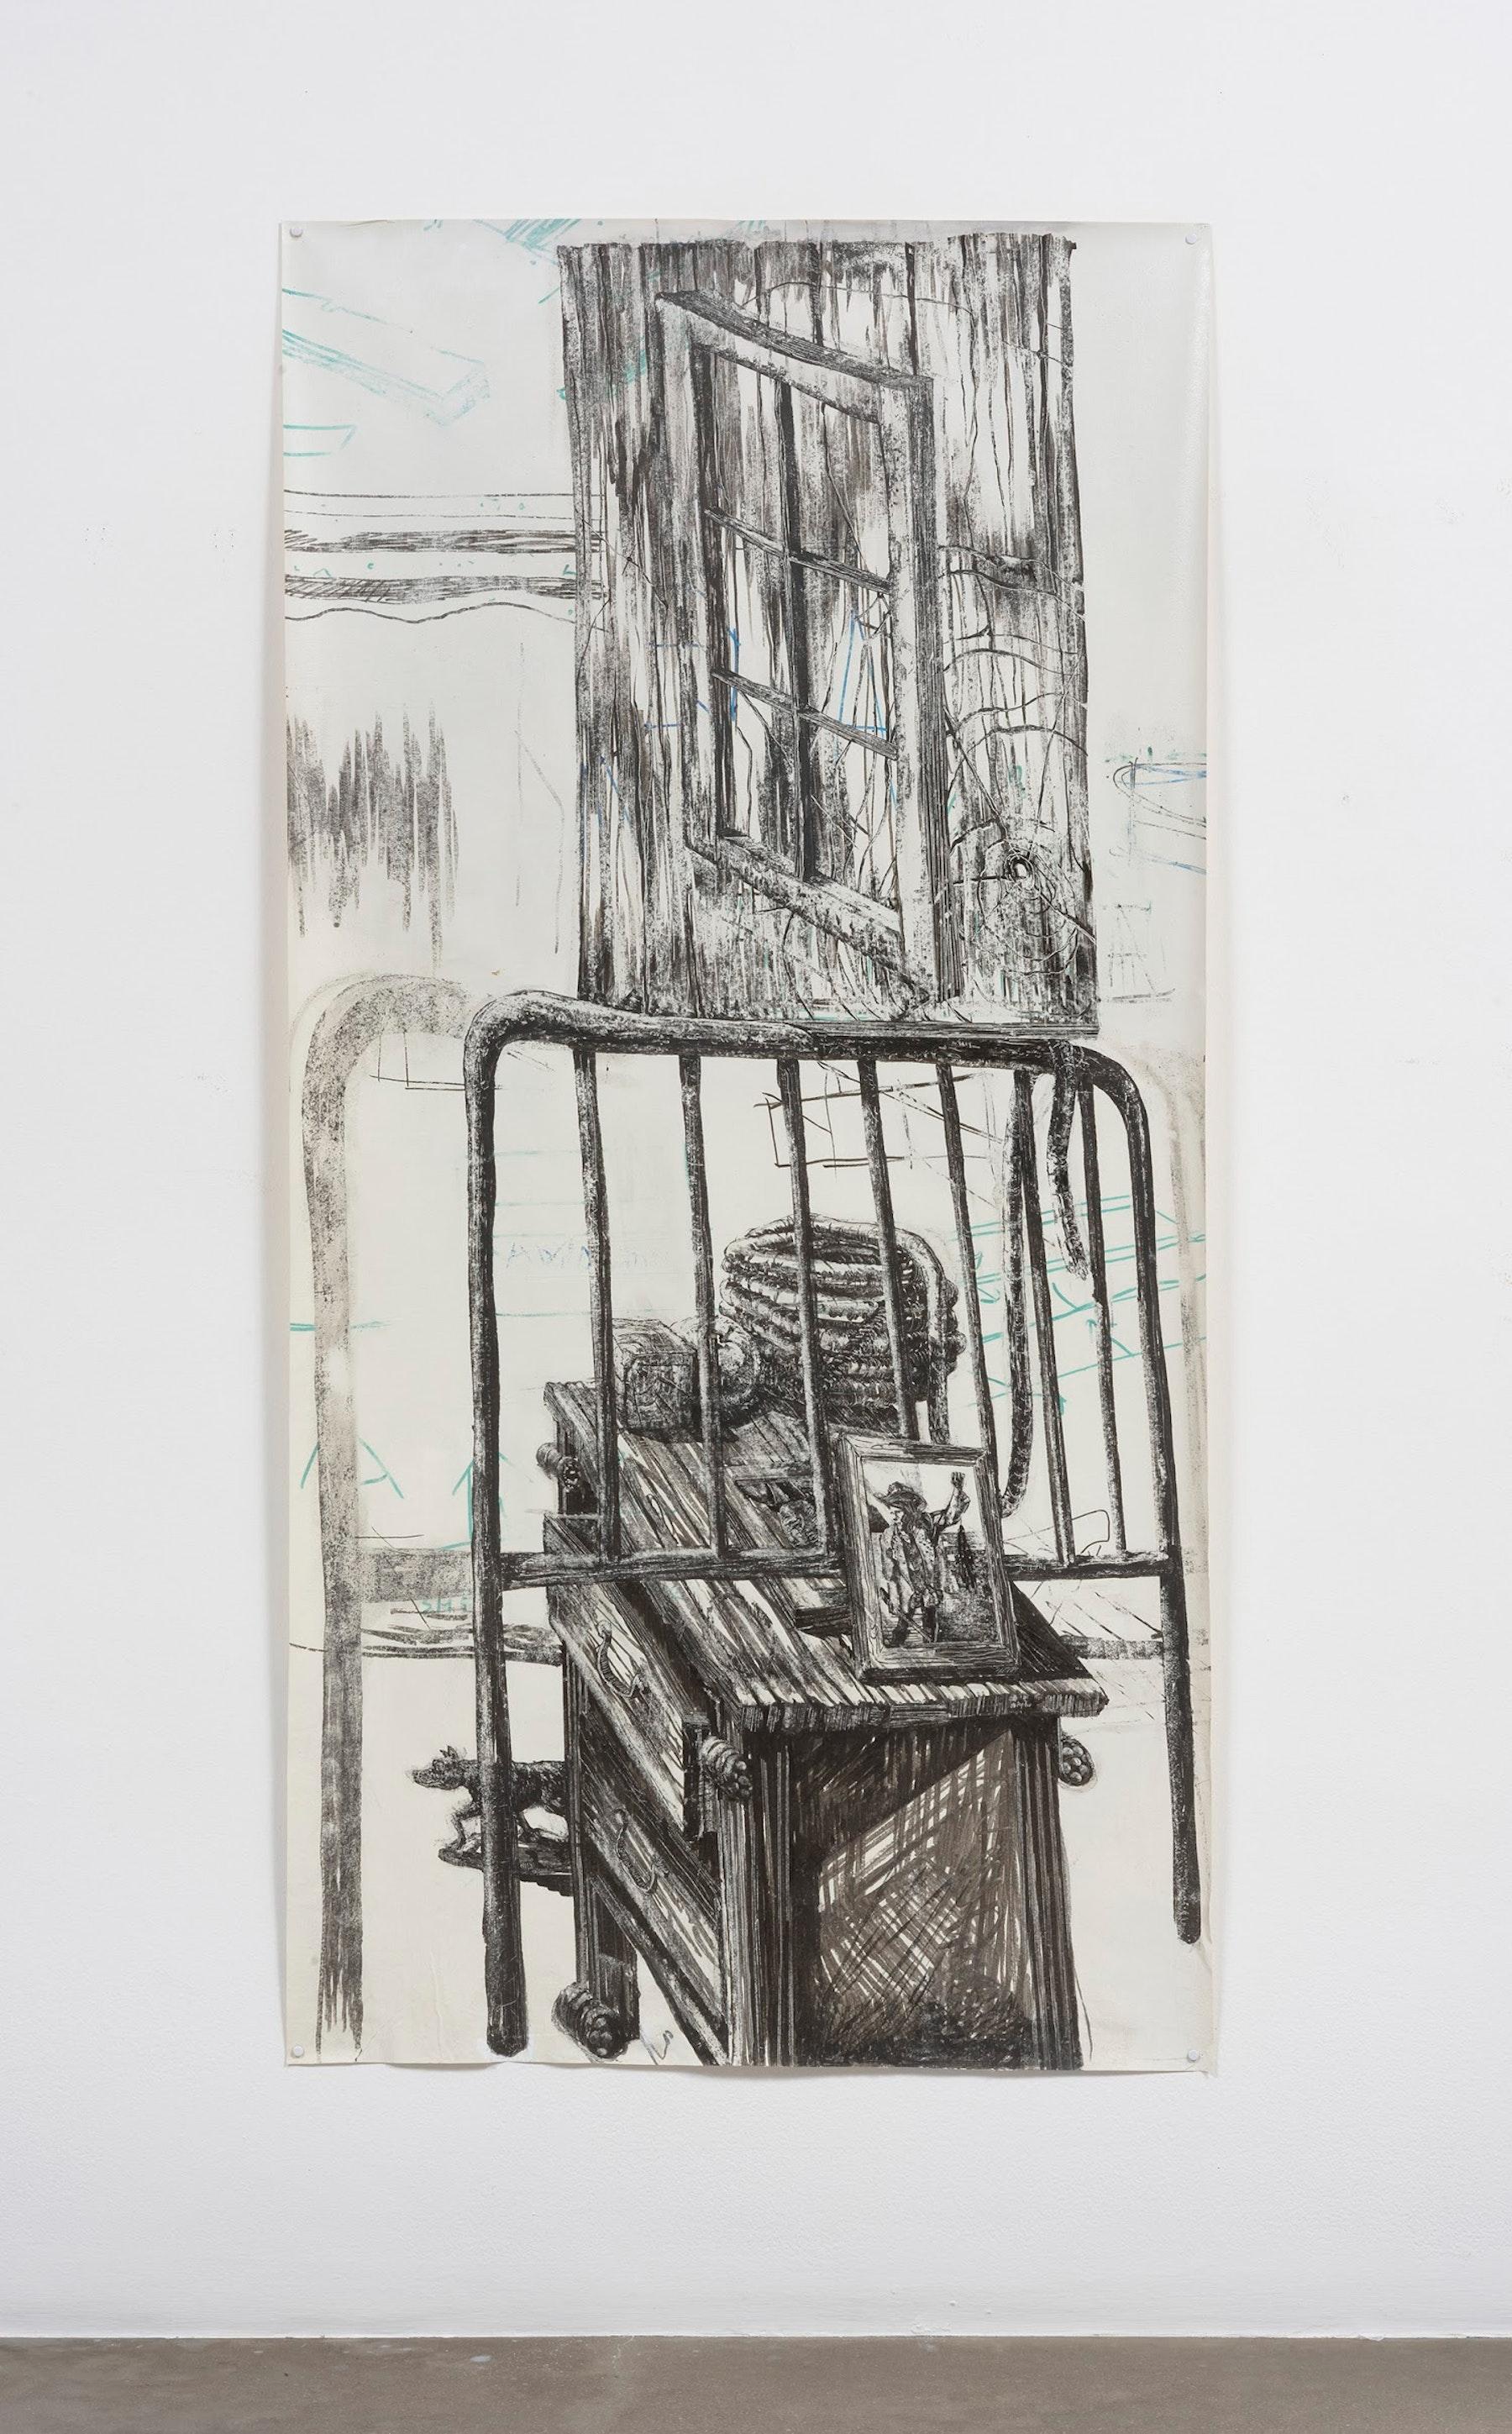 "Edgar Arceneaux ""Migrant's Totem II,"" 2017 Dry erase pen on muslin 69"" x 35"" [HxW] (175.26 x 88.9 cm) Inventory #ARC568 Courtesy of the artist and Vielmetter Los Angeles Photo credit: Jeff McLane"